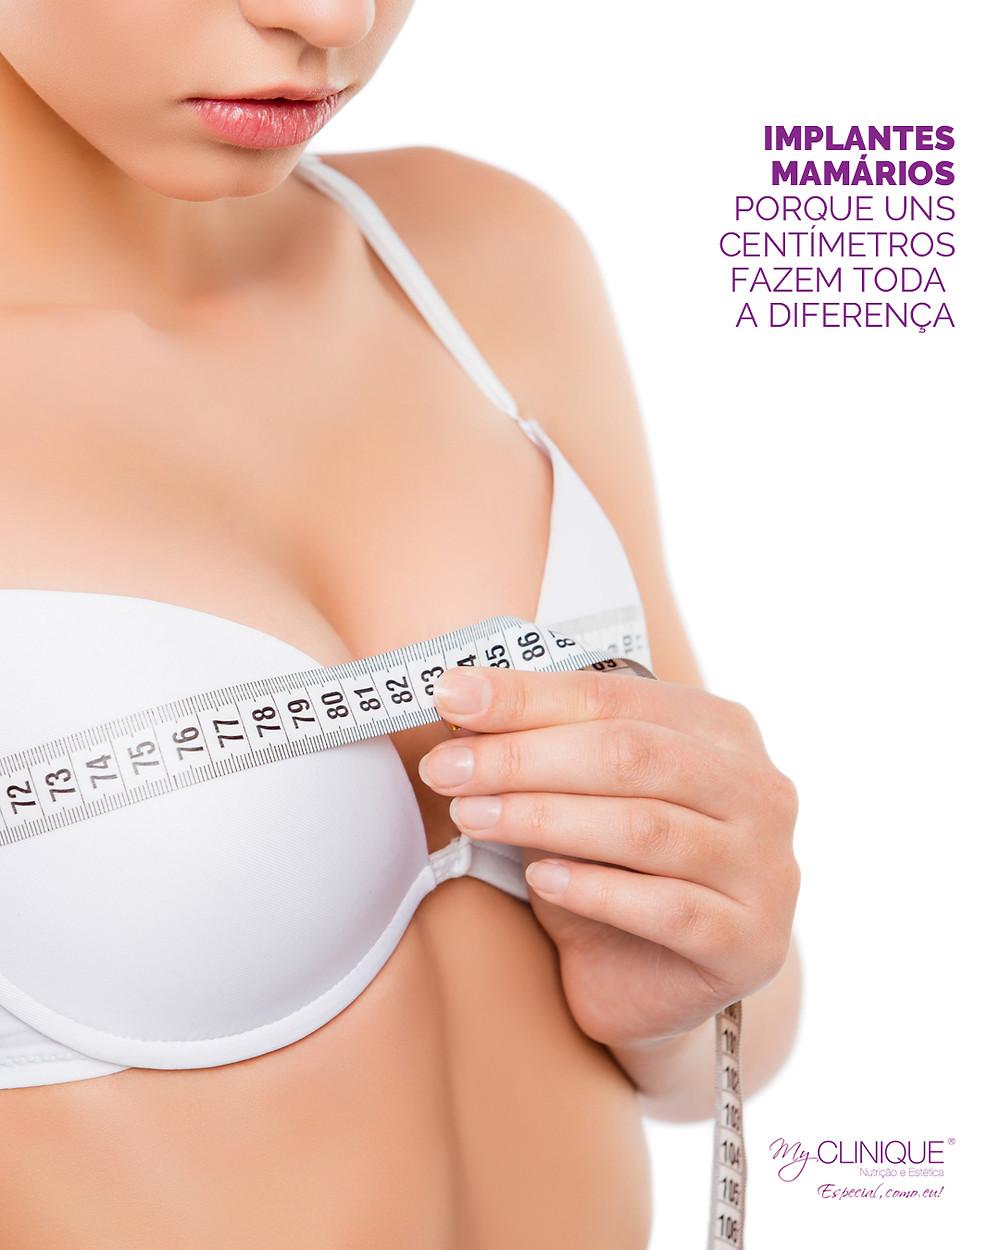 myclinique cirurgia das mamas